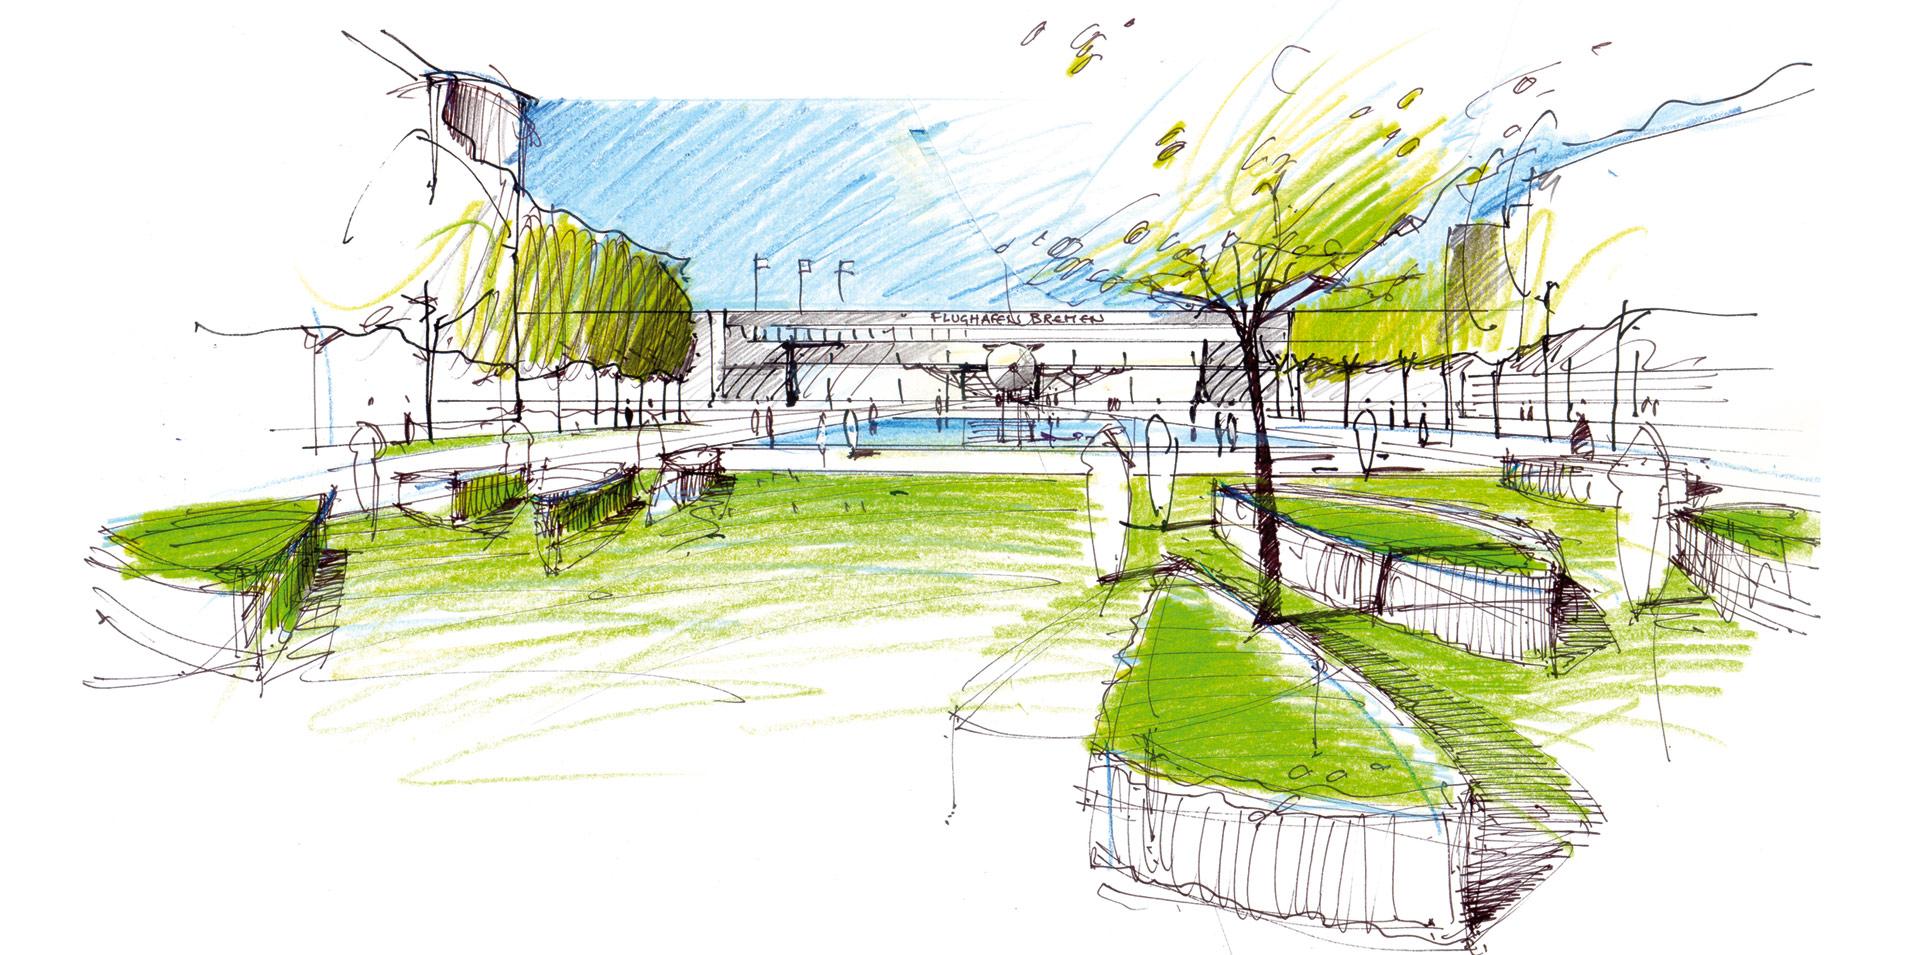 download landschaftsarchitektur garten skizze | siteminsk, Gartengestaltung